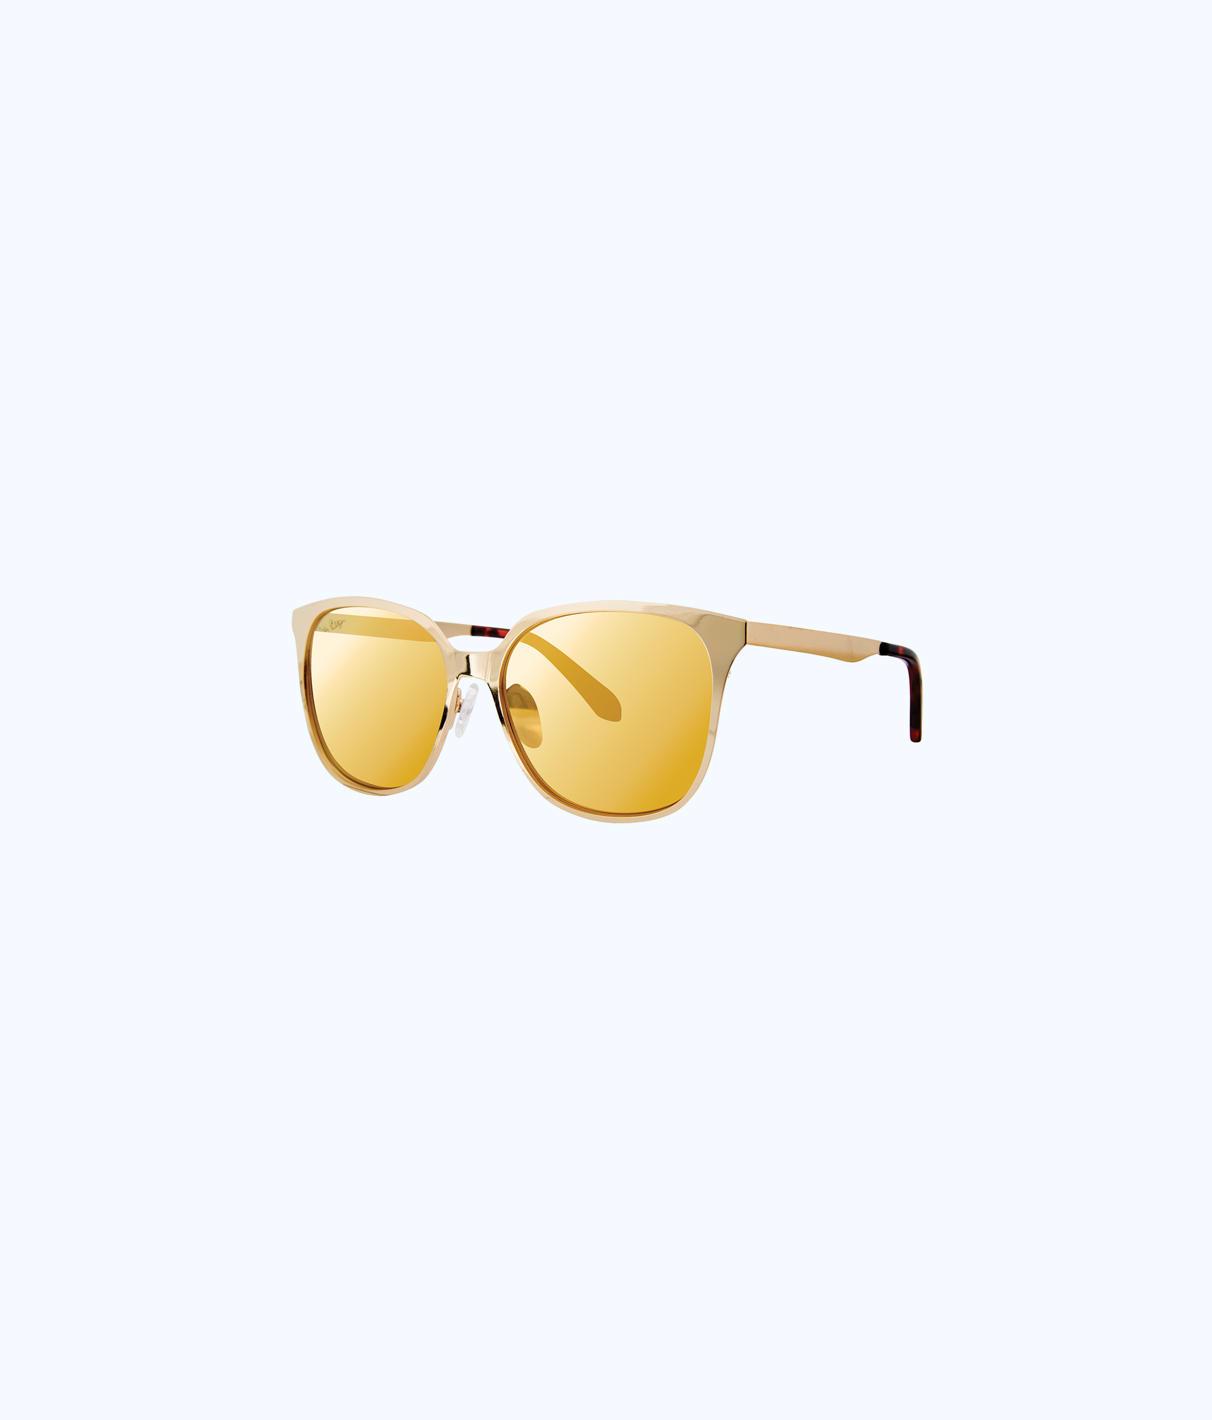 Lilly Pulitzer Lilly Pulitzer Landon Sunglasses